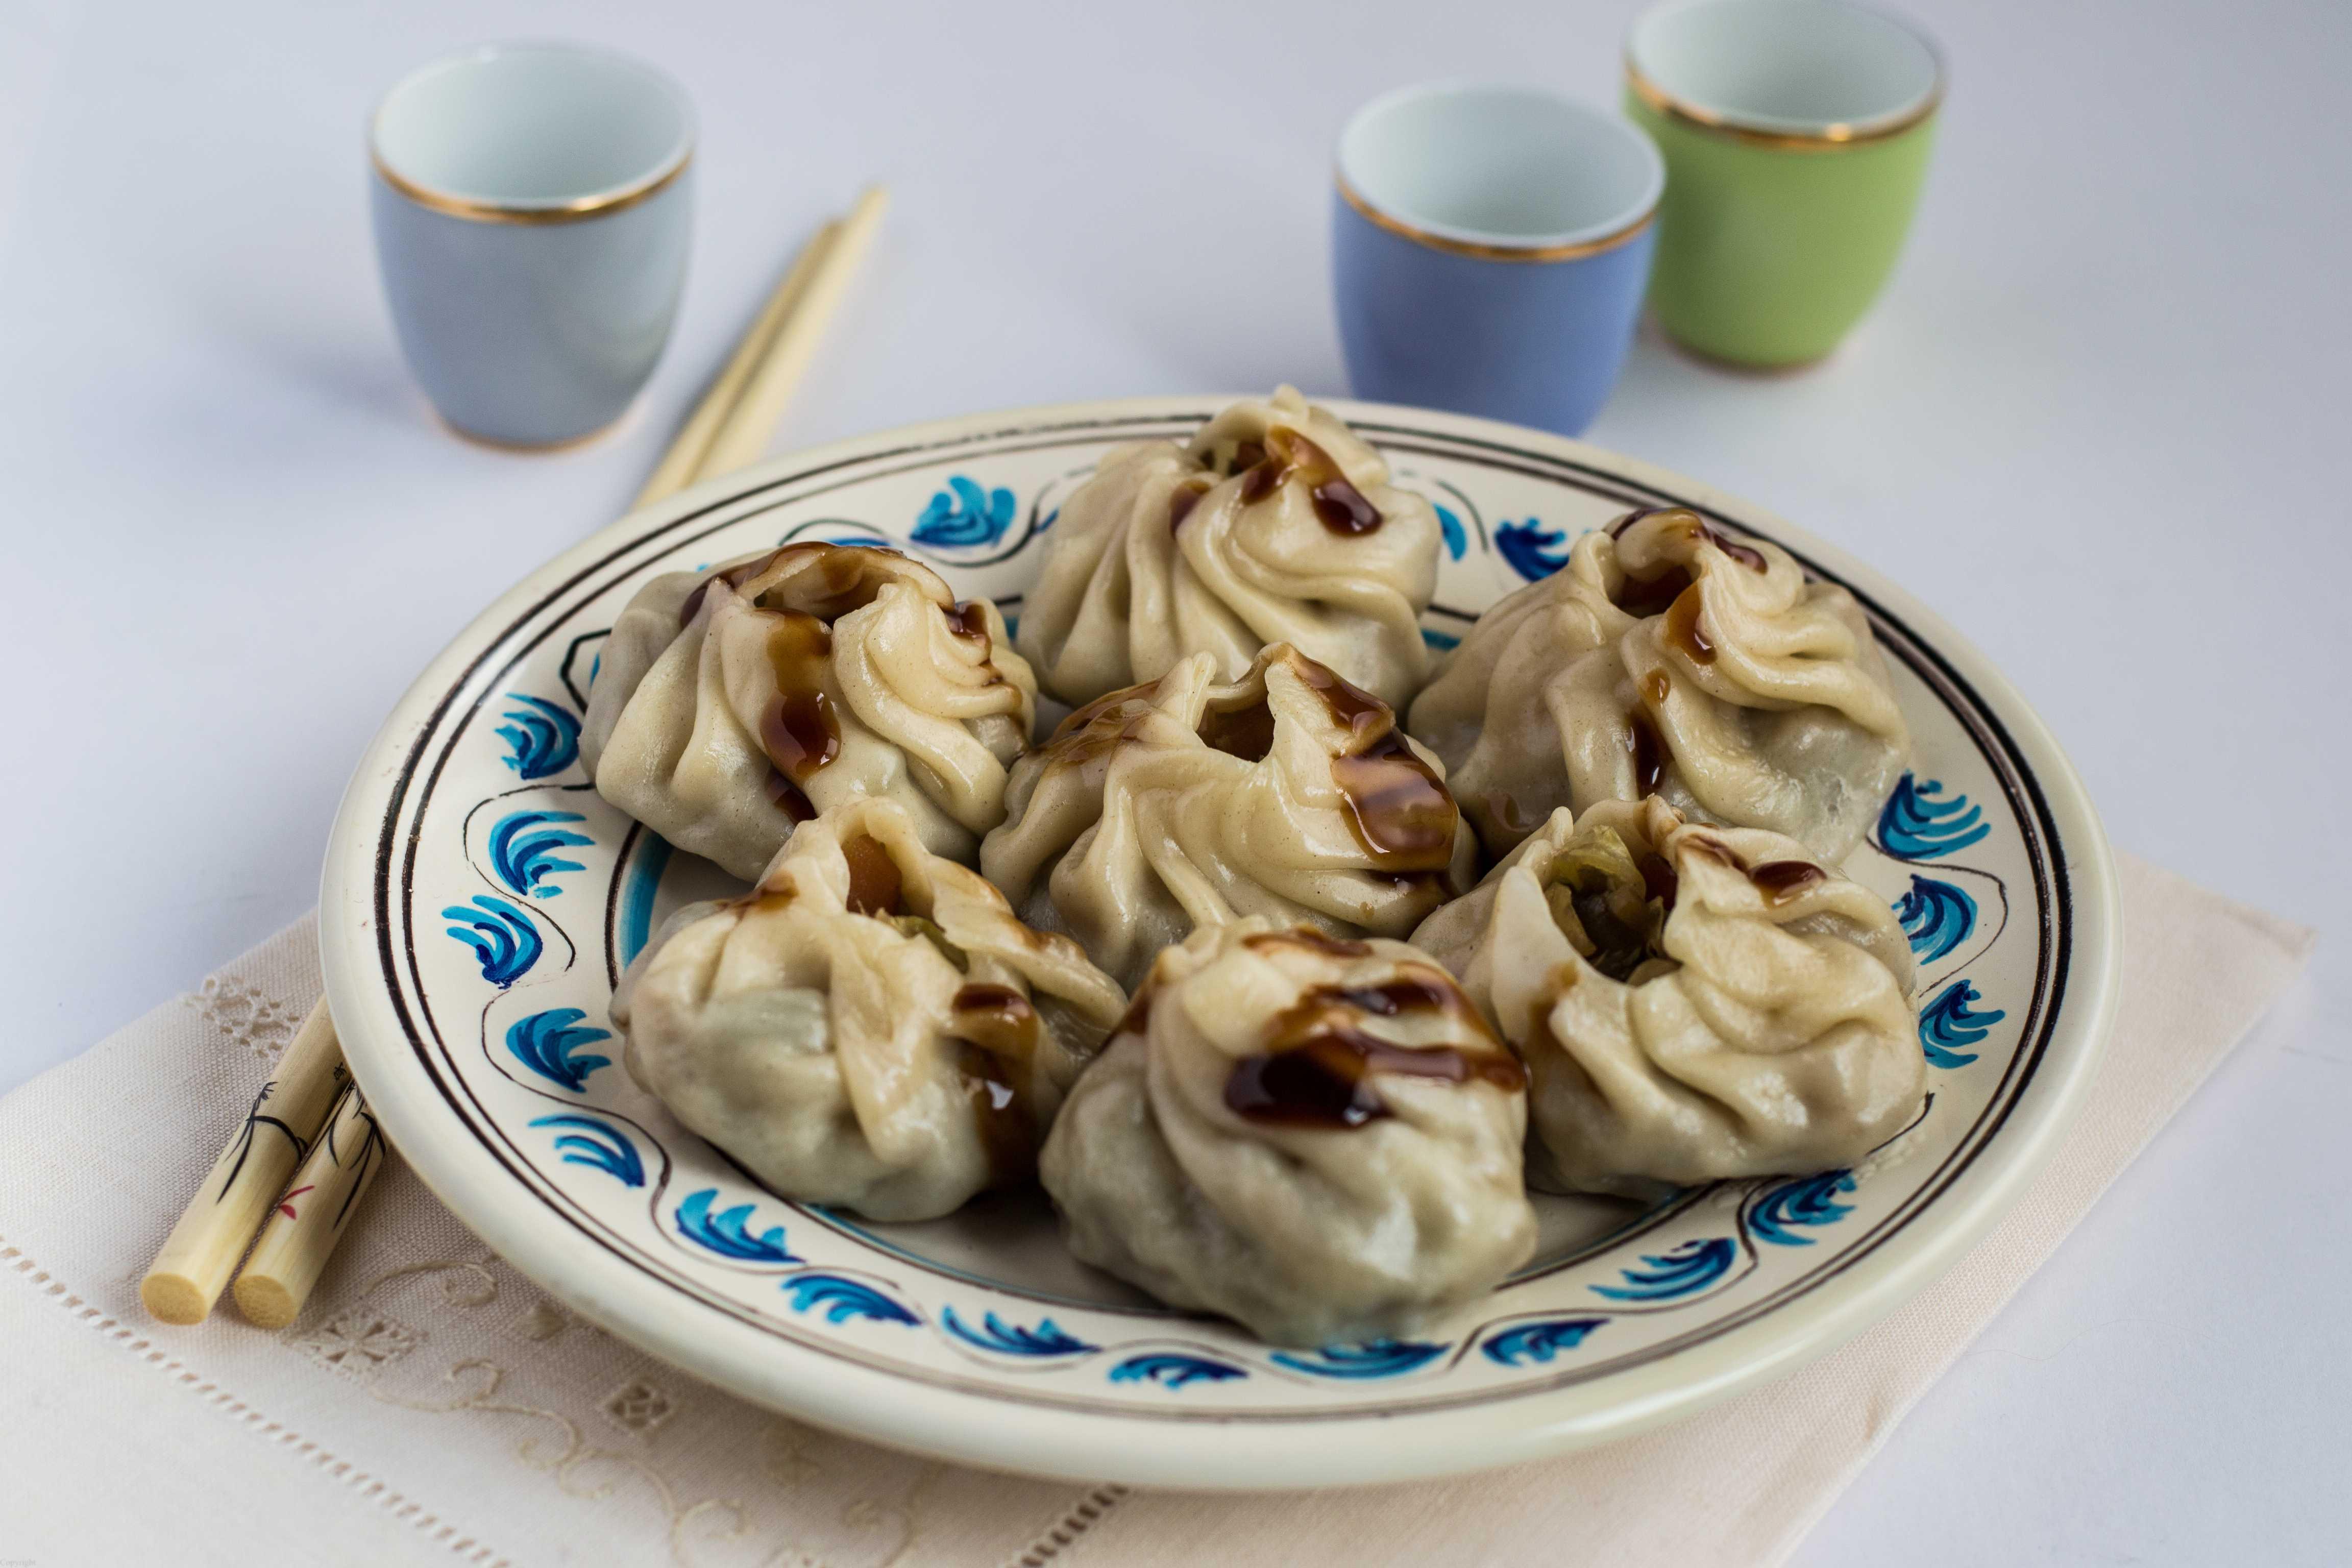 Ricetta Ravioli Al Vapore Vegetariani.Ravioli Cinesi Di Verdure Al Vapore Ricette Tamara Giorgetti D Repubblica It